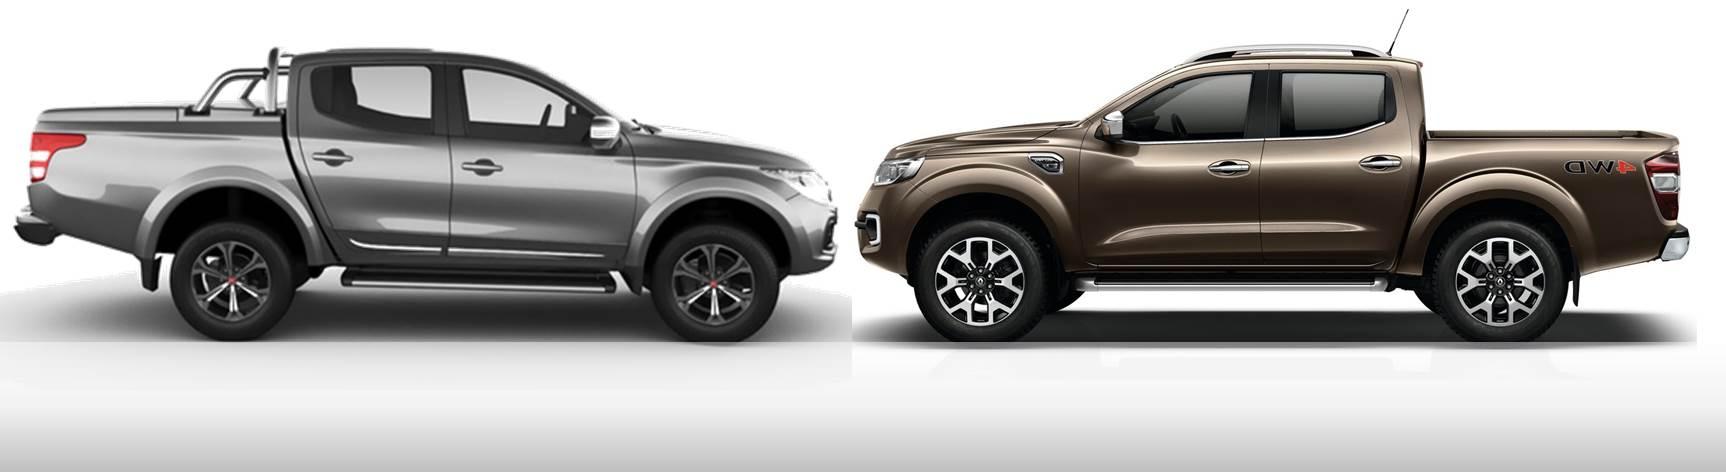 Renault Alaskan And Fiat Fullback Join A Growing Segment Jato